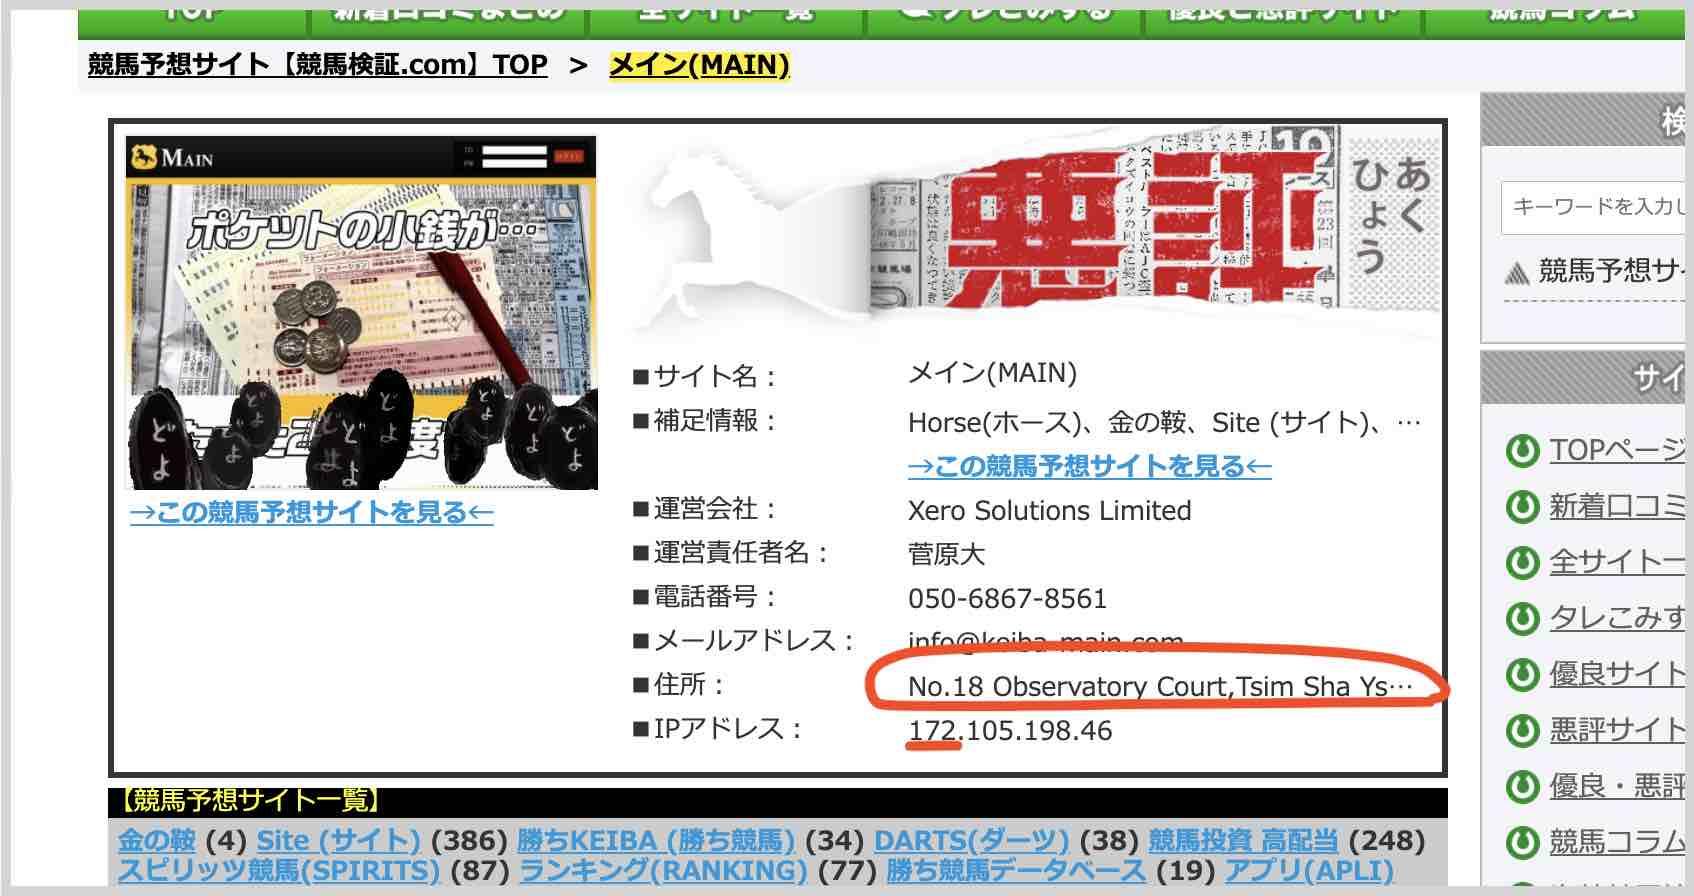 STATION(ステーション)という競馬予想サイトのグループサイト、メインも香港にある?